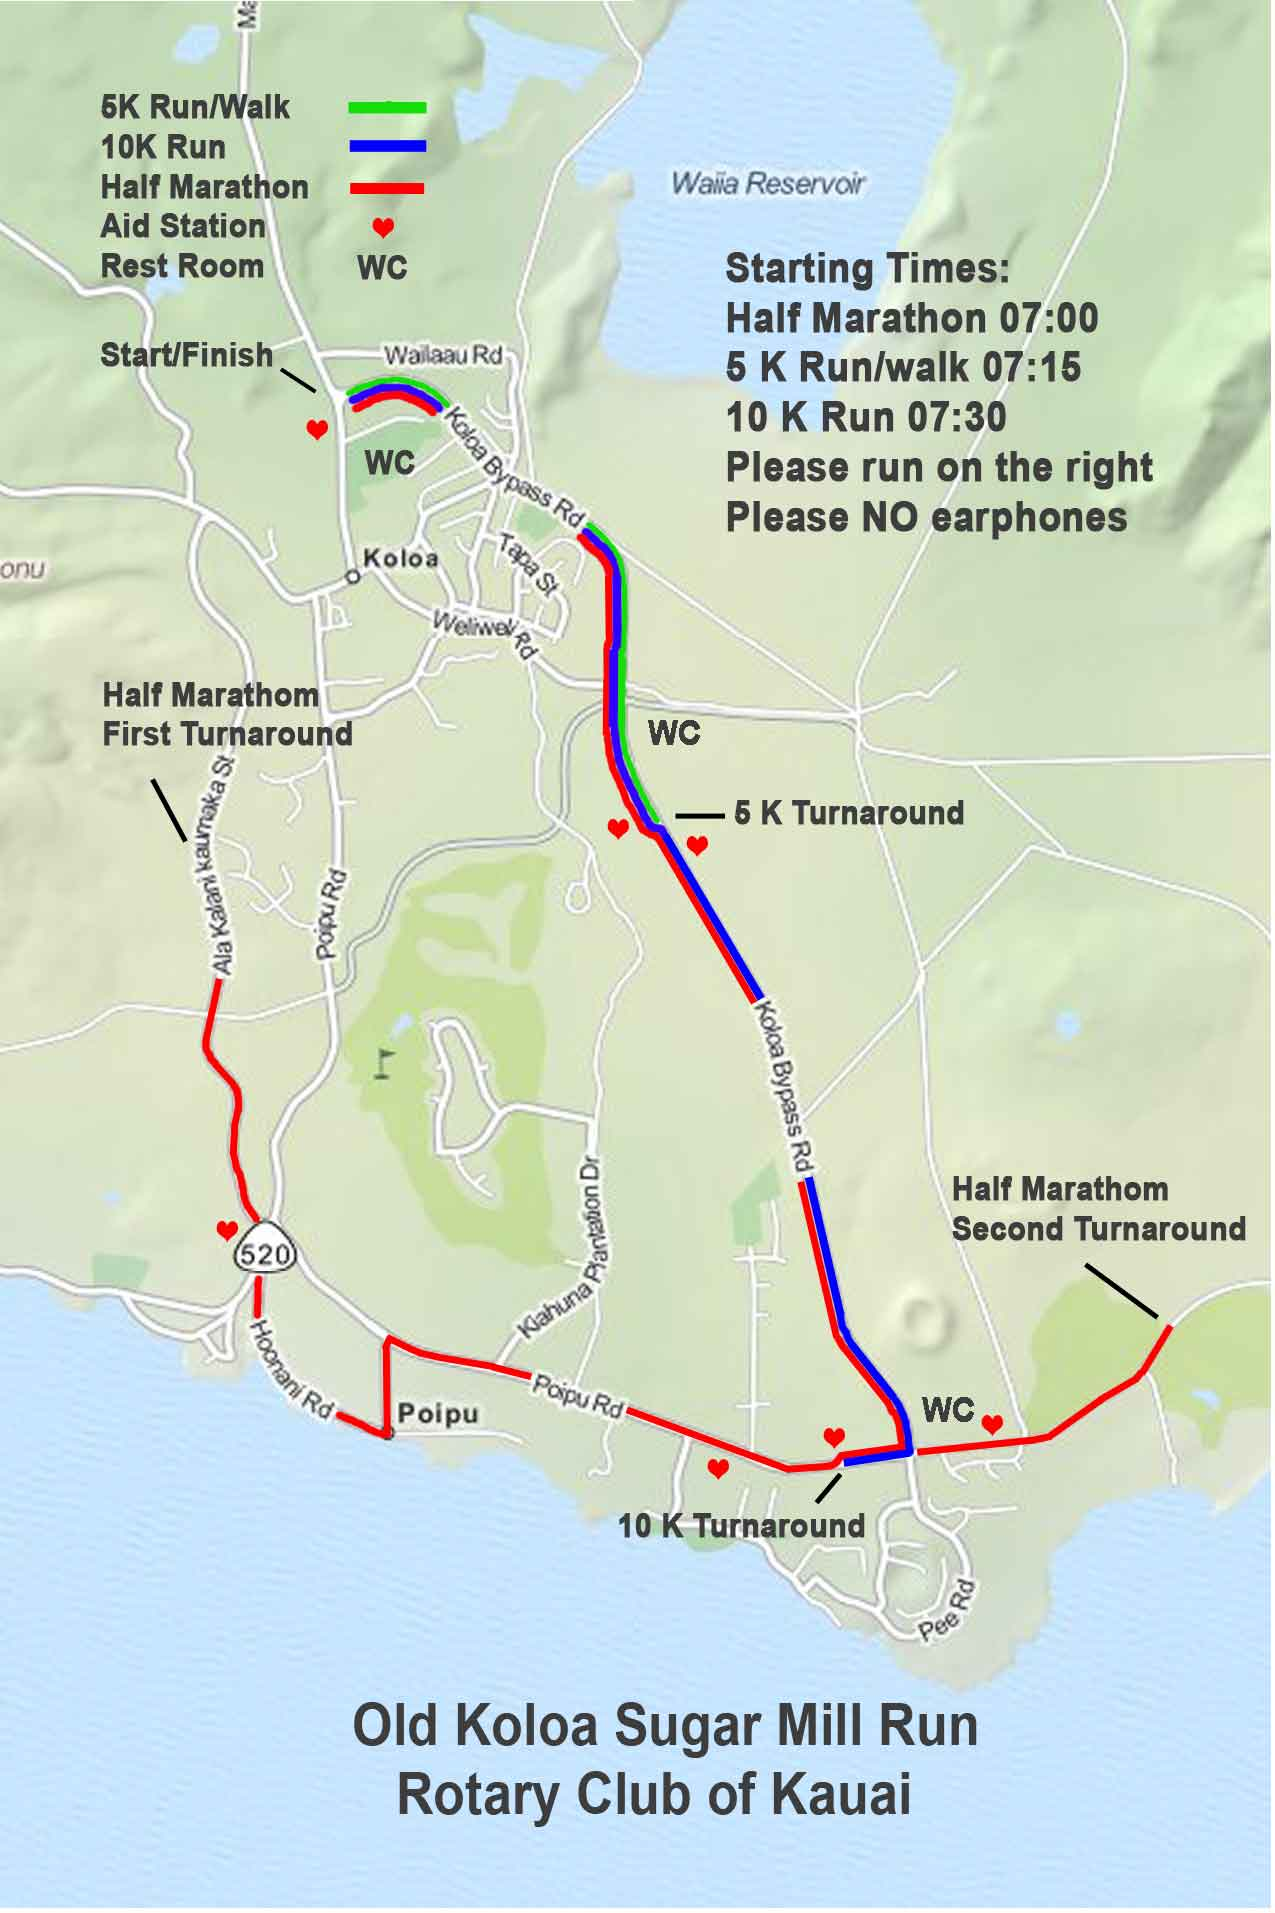 Old Koloa Sugar Mill Run Map - Sponsored by the Rotary Club of Kaua'i